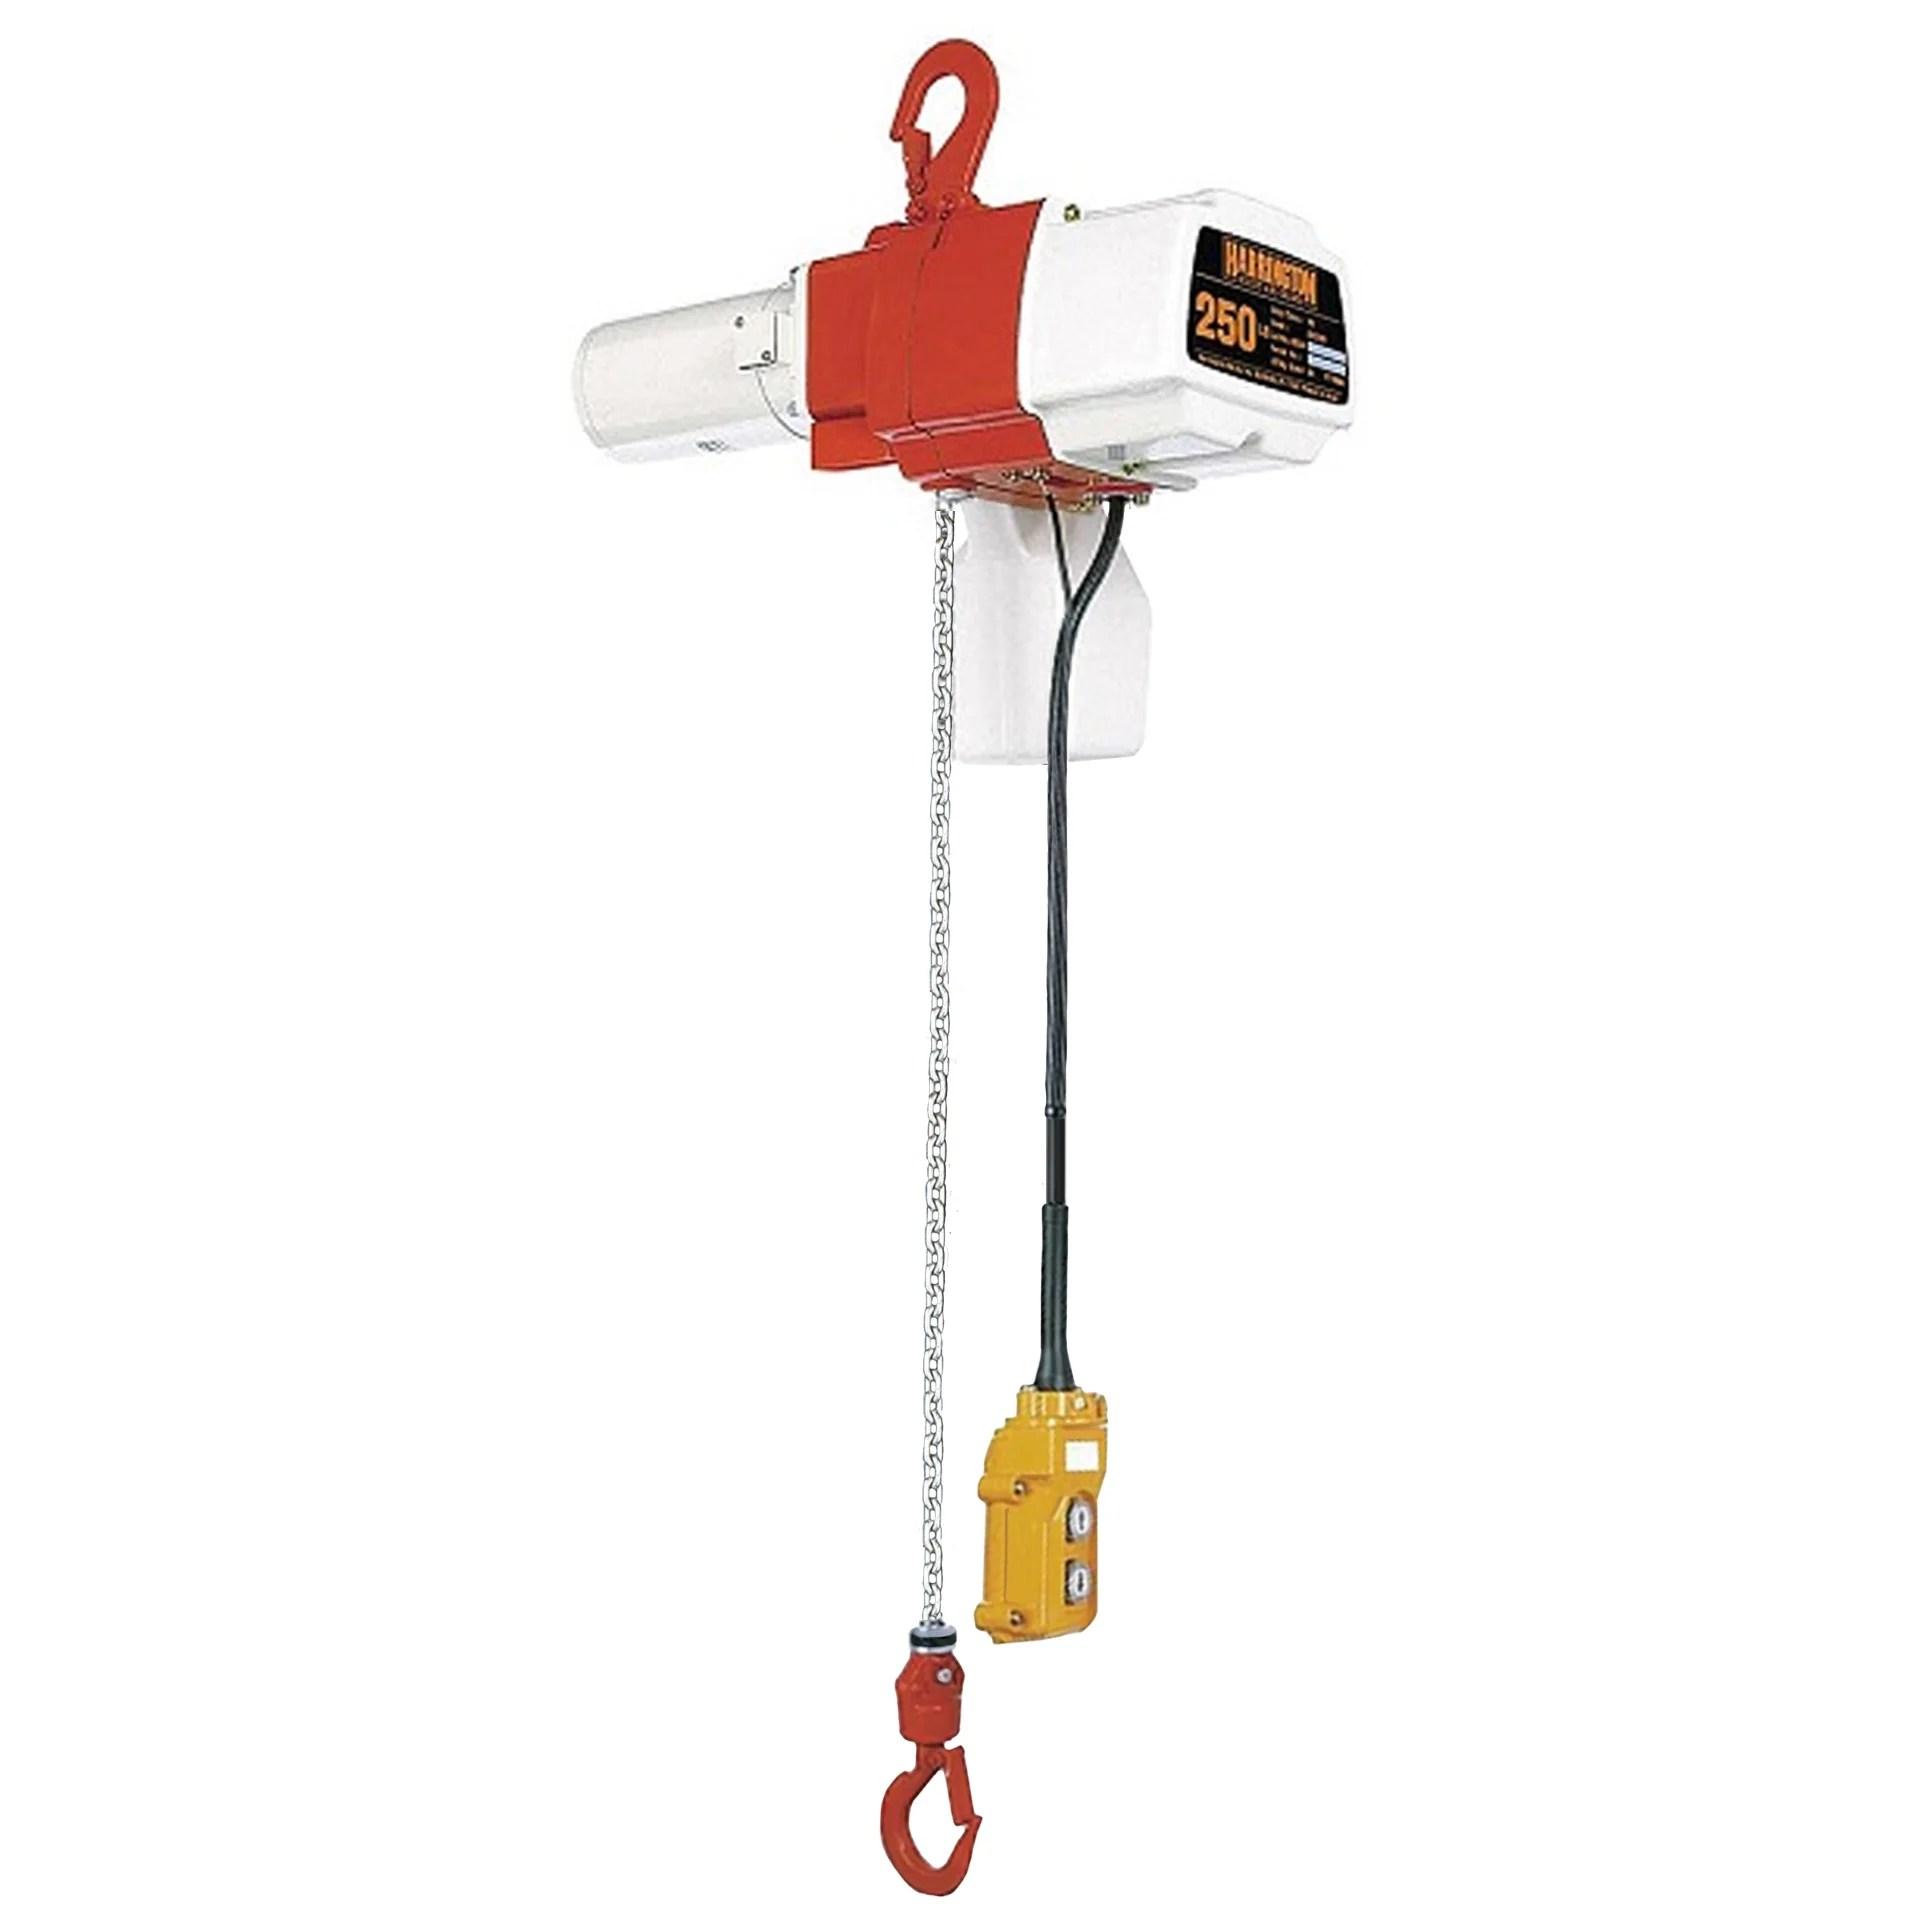 hight resolution of 1 2 ton harrington ed series adjustable single speed single phase cranedepot